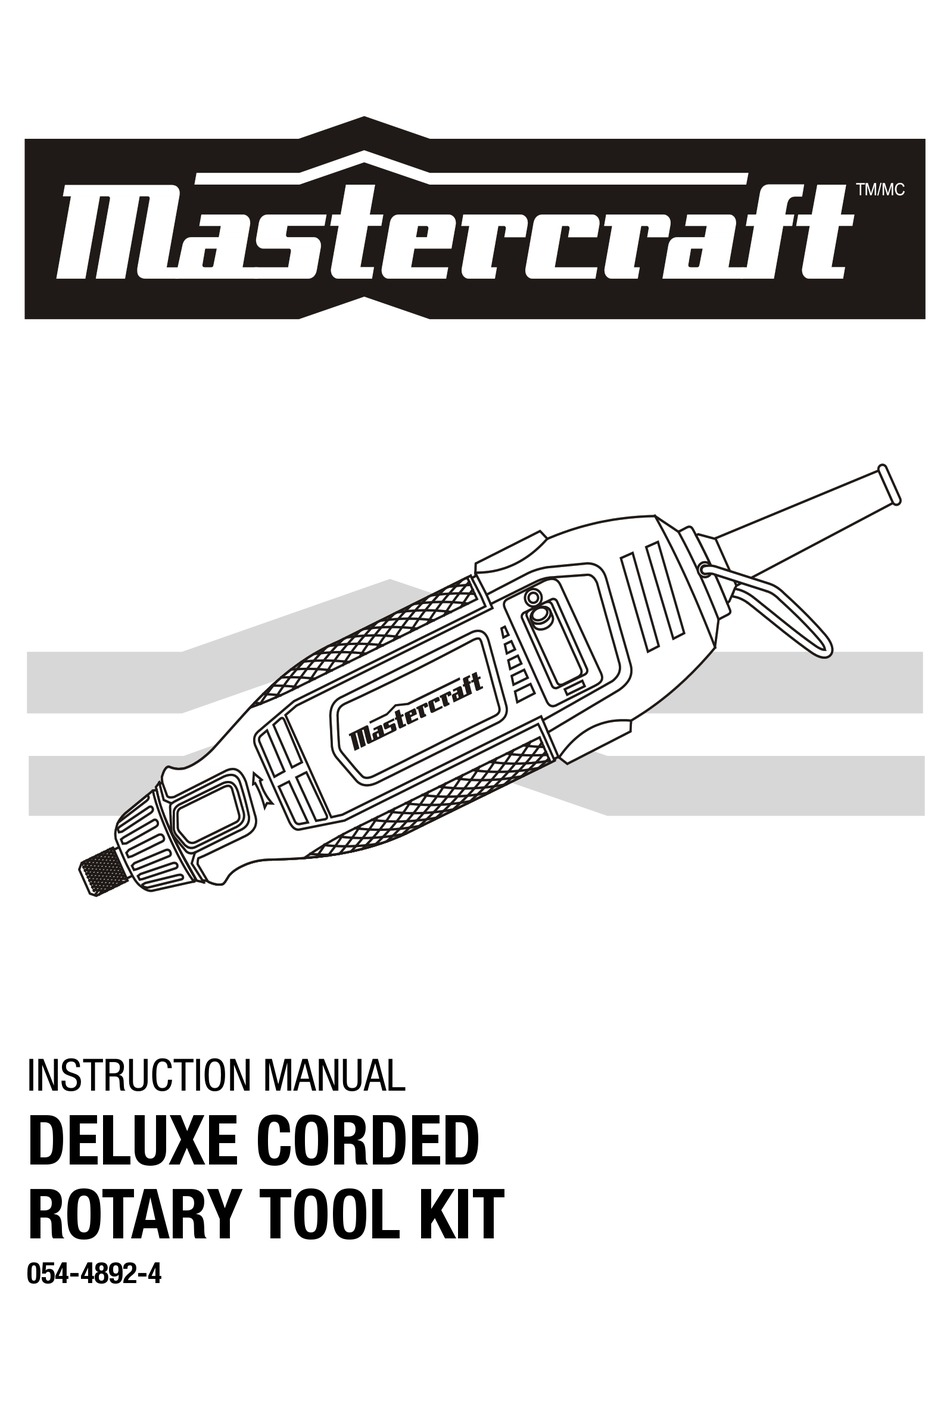 MASTERCRAFT 54-4892-4 INSTRUCTION MANUAL Pdf Download